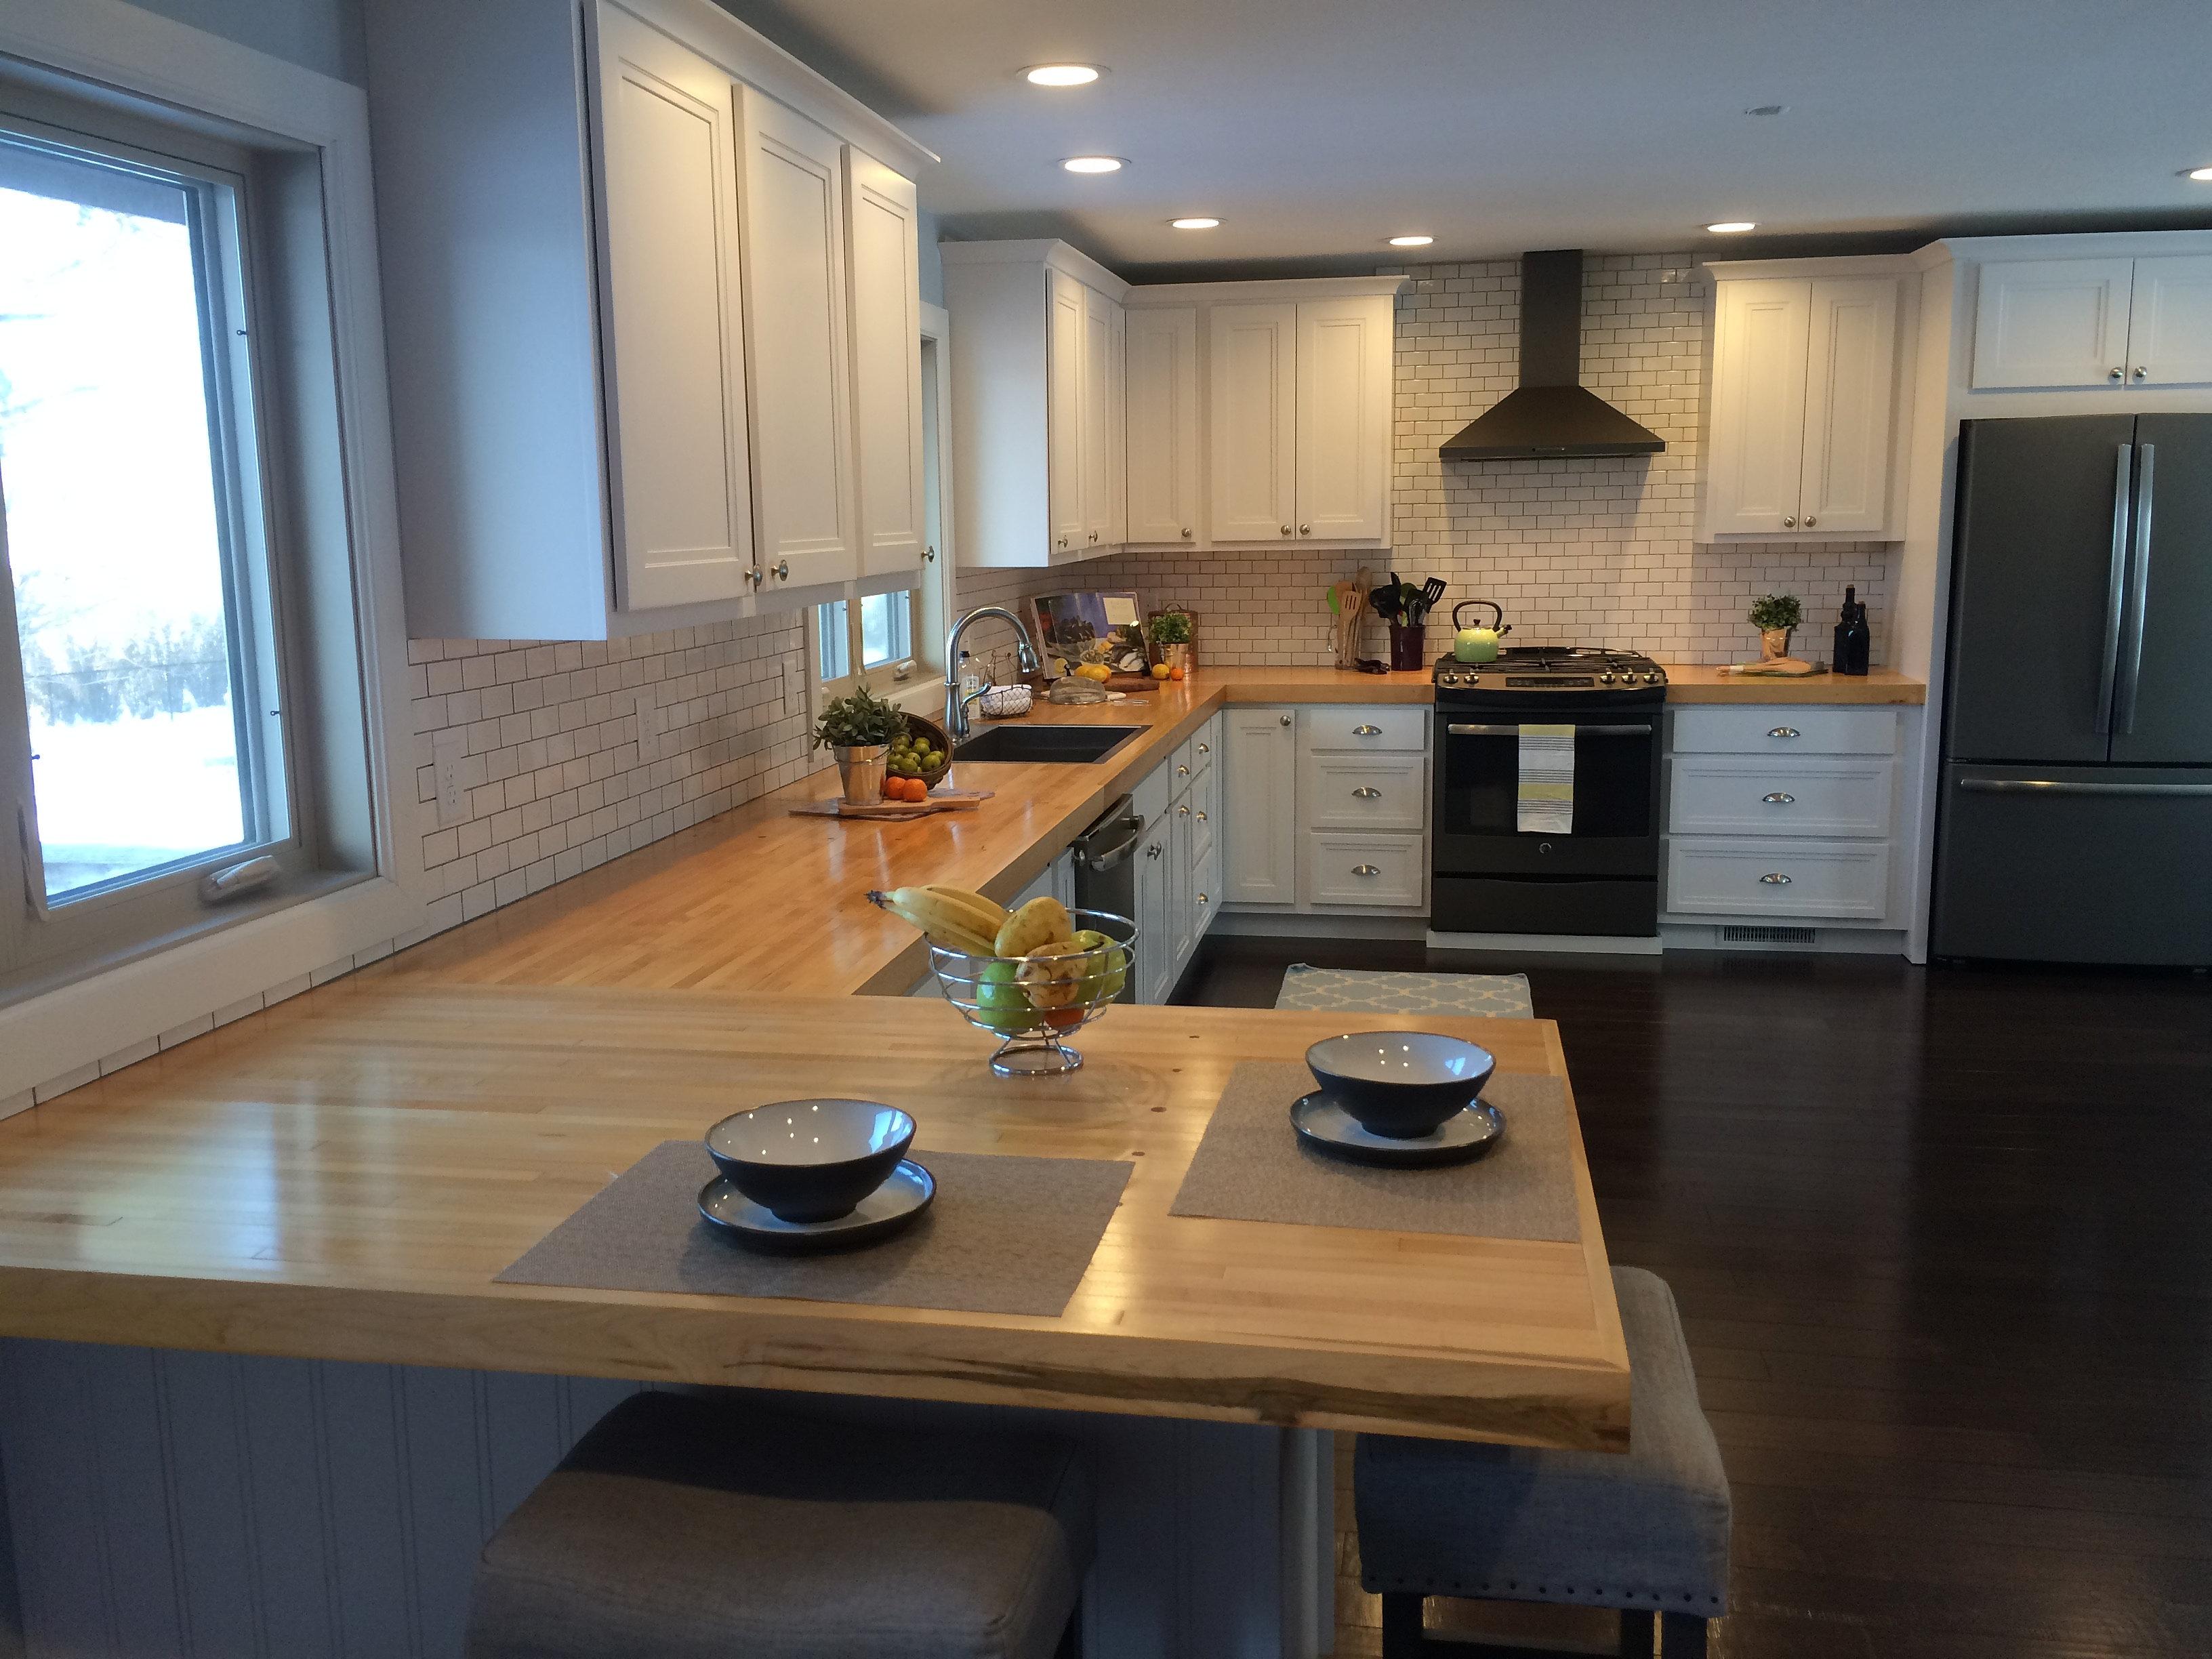 lightbox image 1nqq select kitchen design JPG